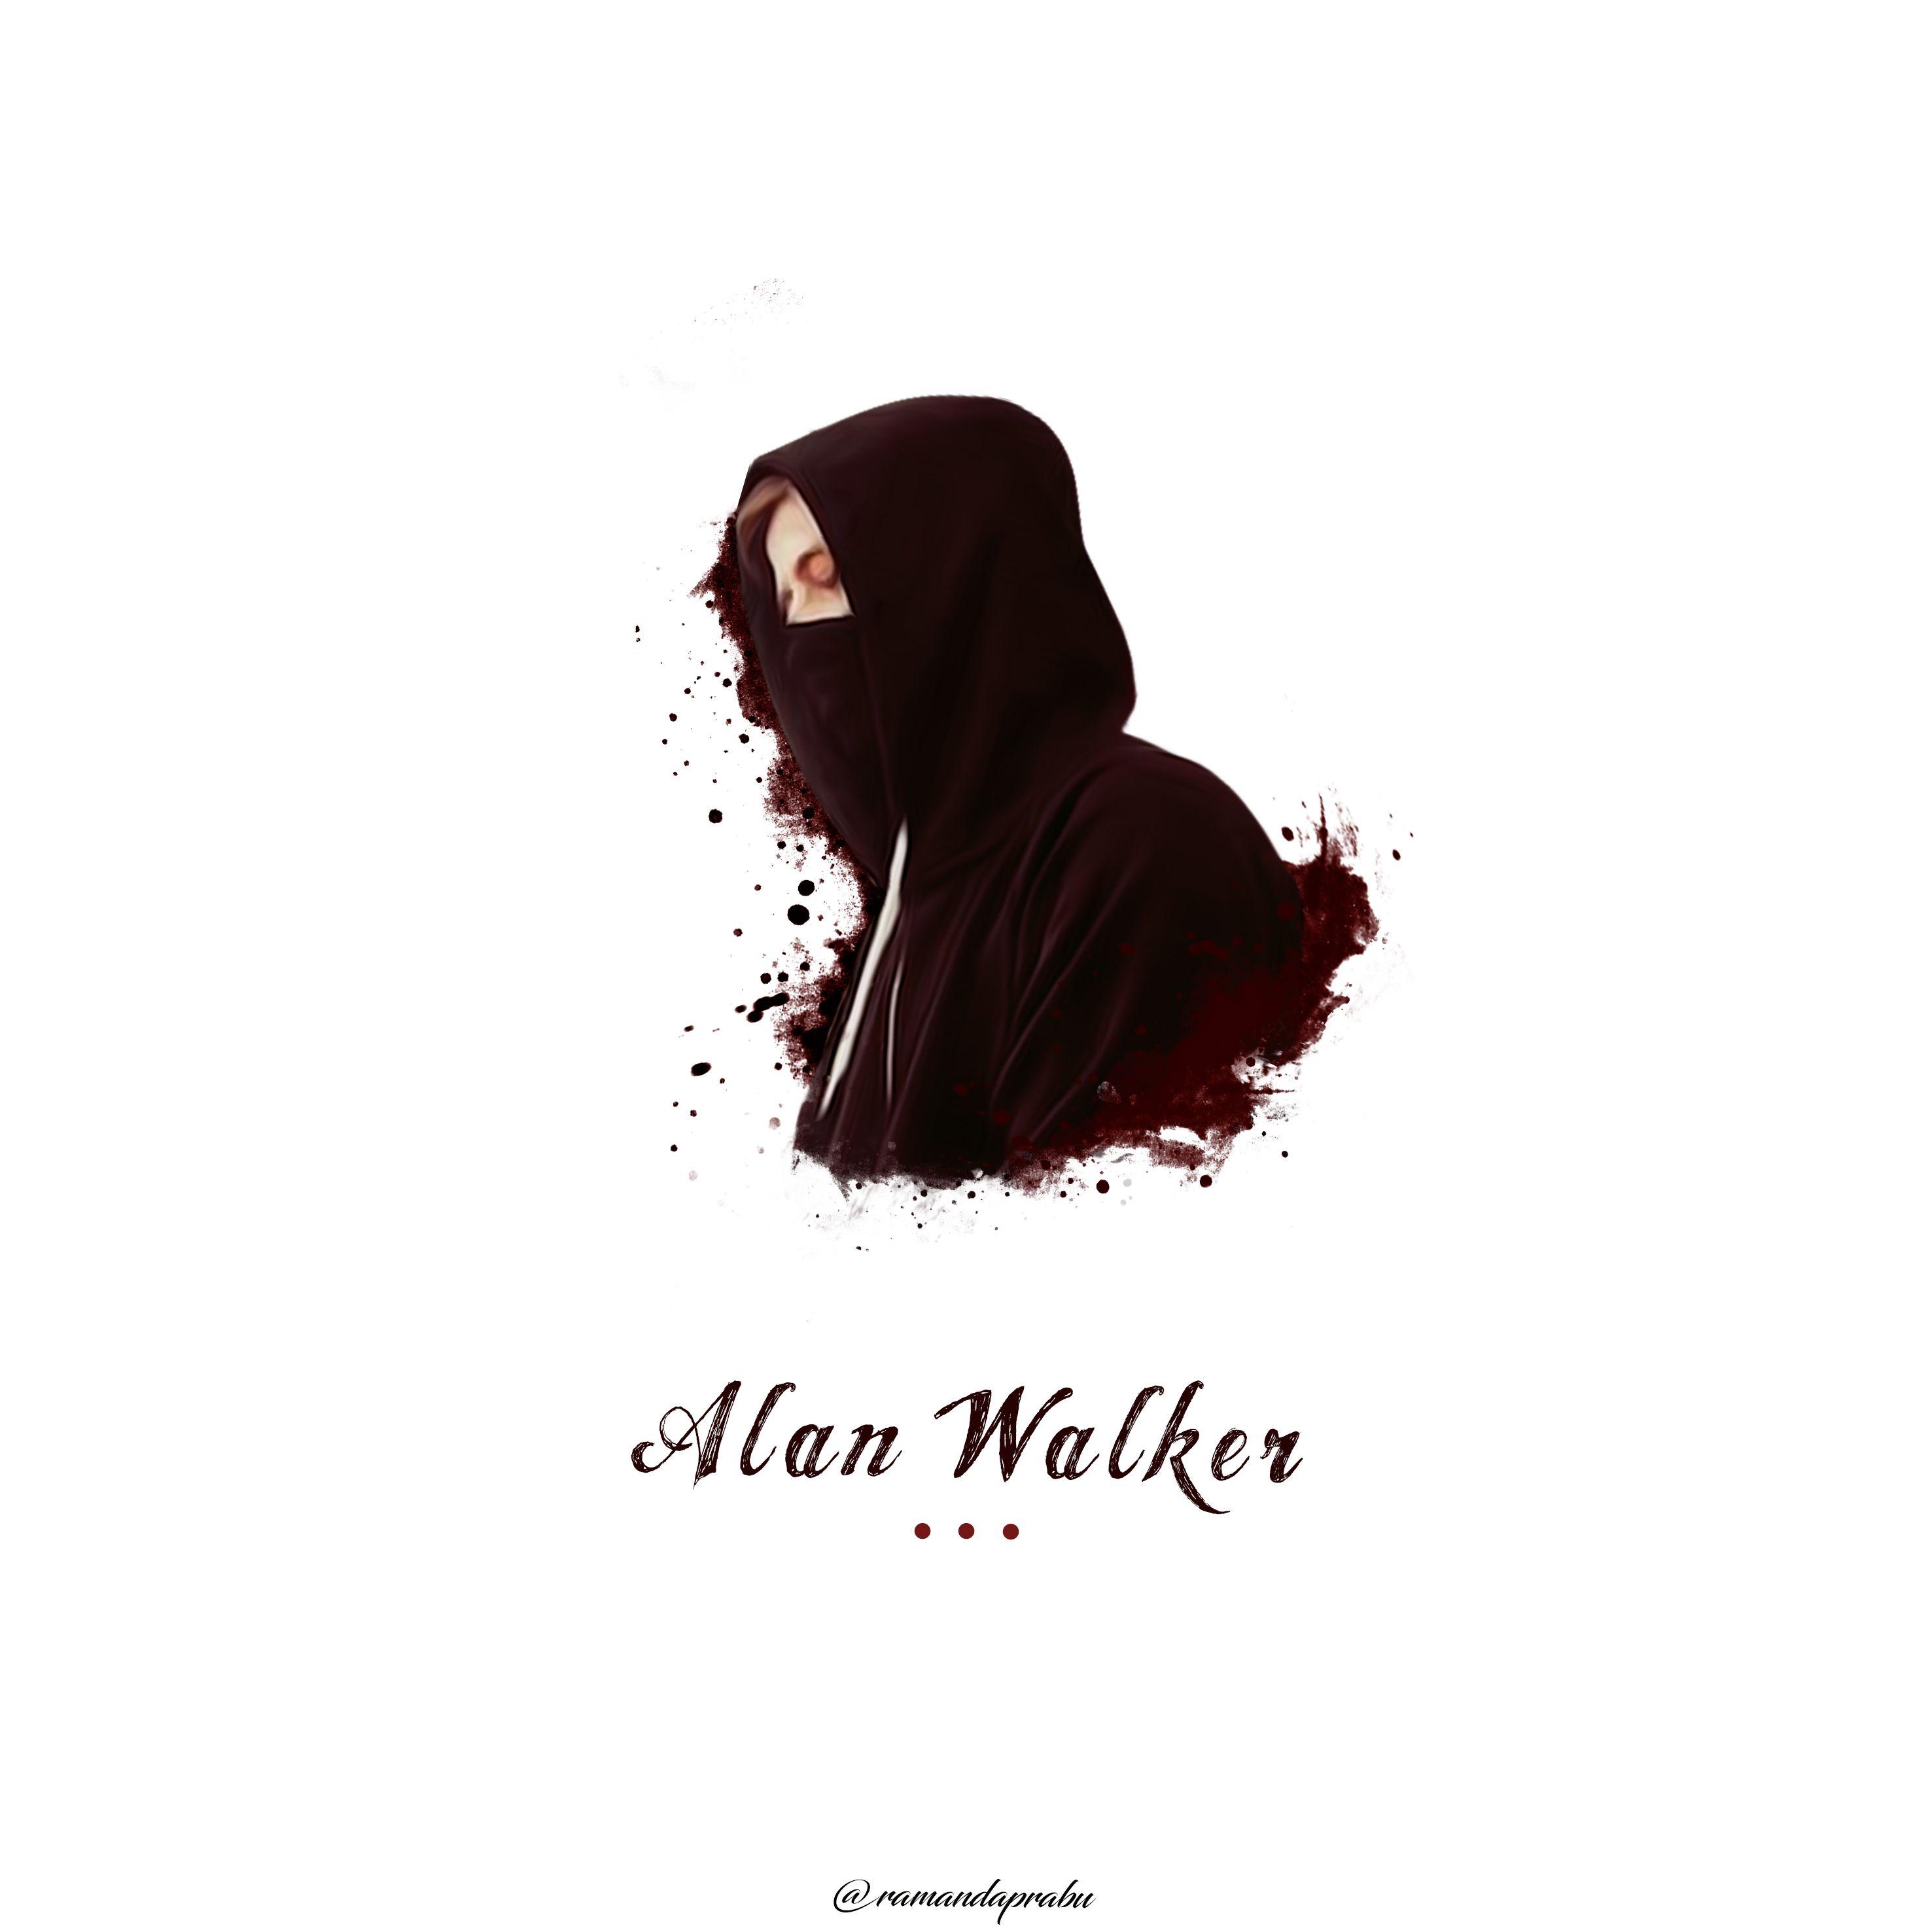 Alan Walker Alan Walker Allen Walker Walker